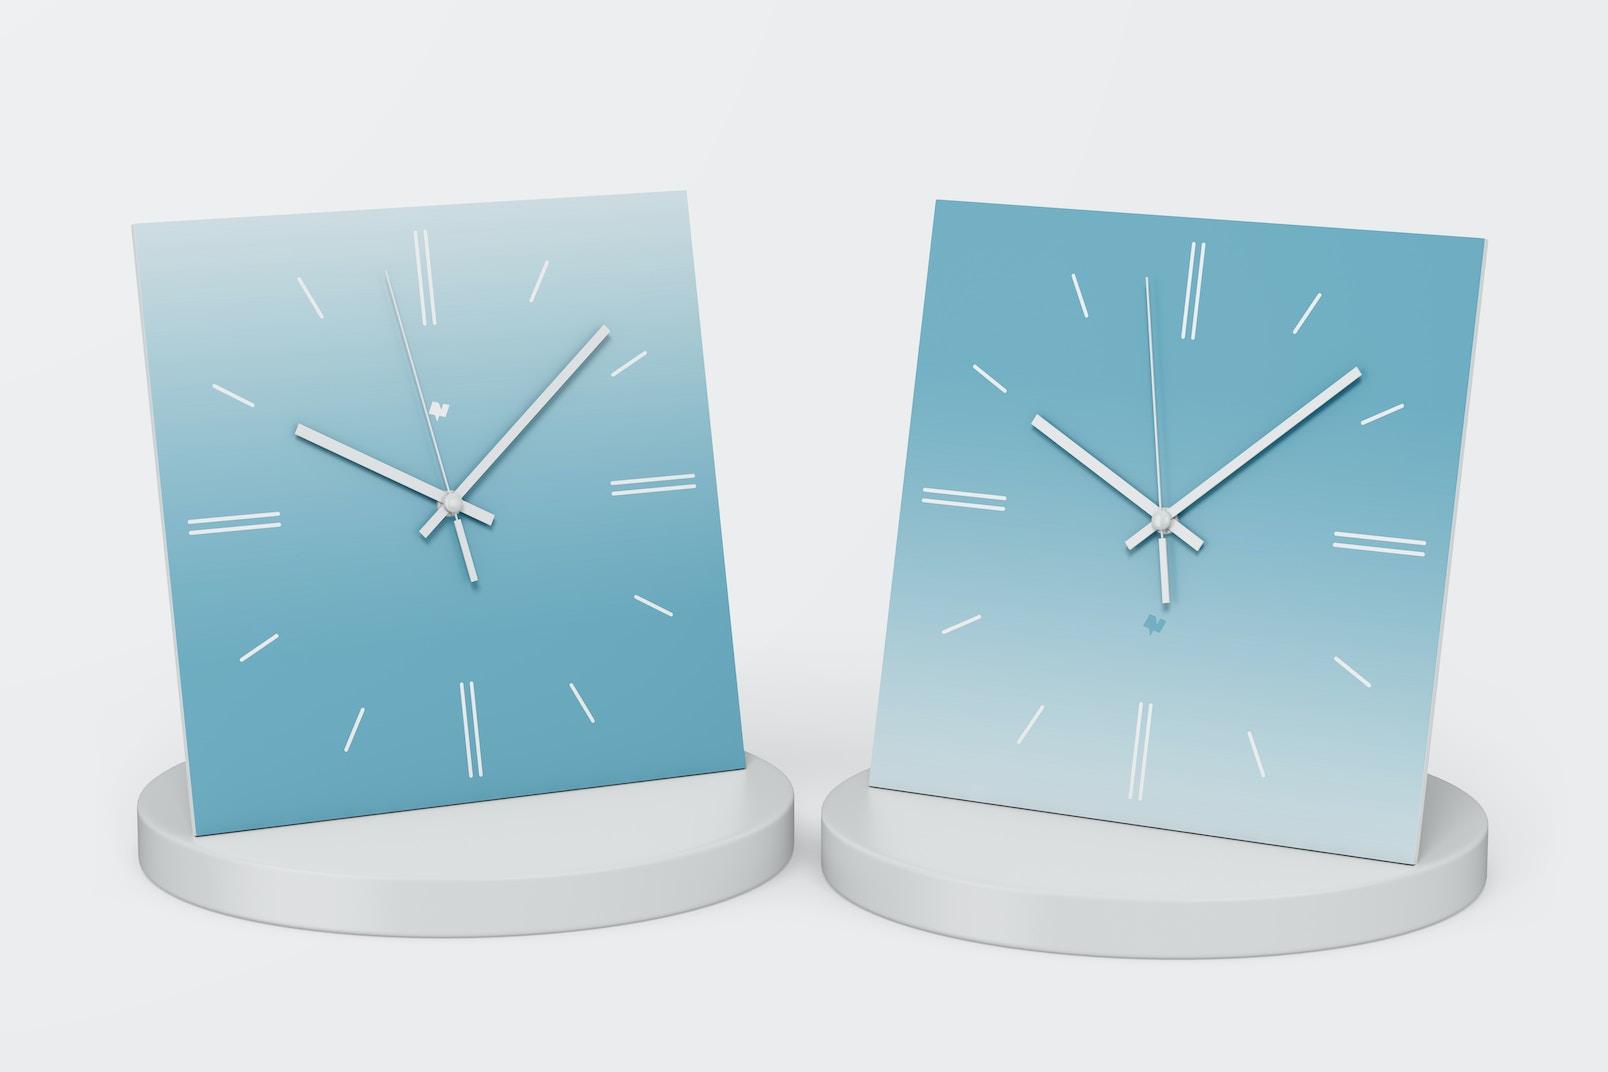 Square Wall Clocks Mockup